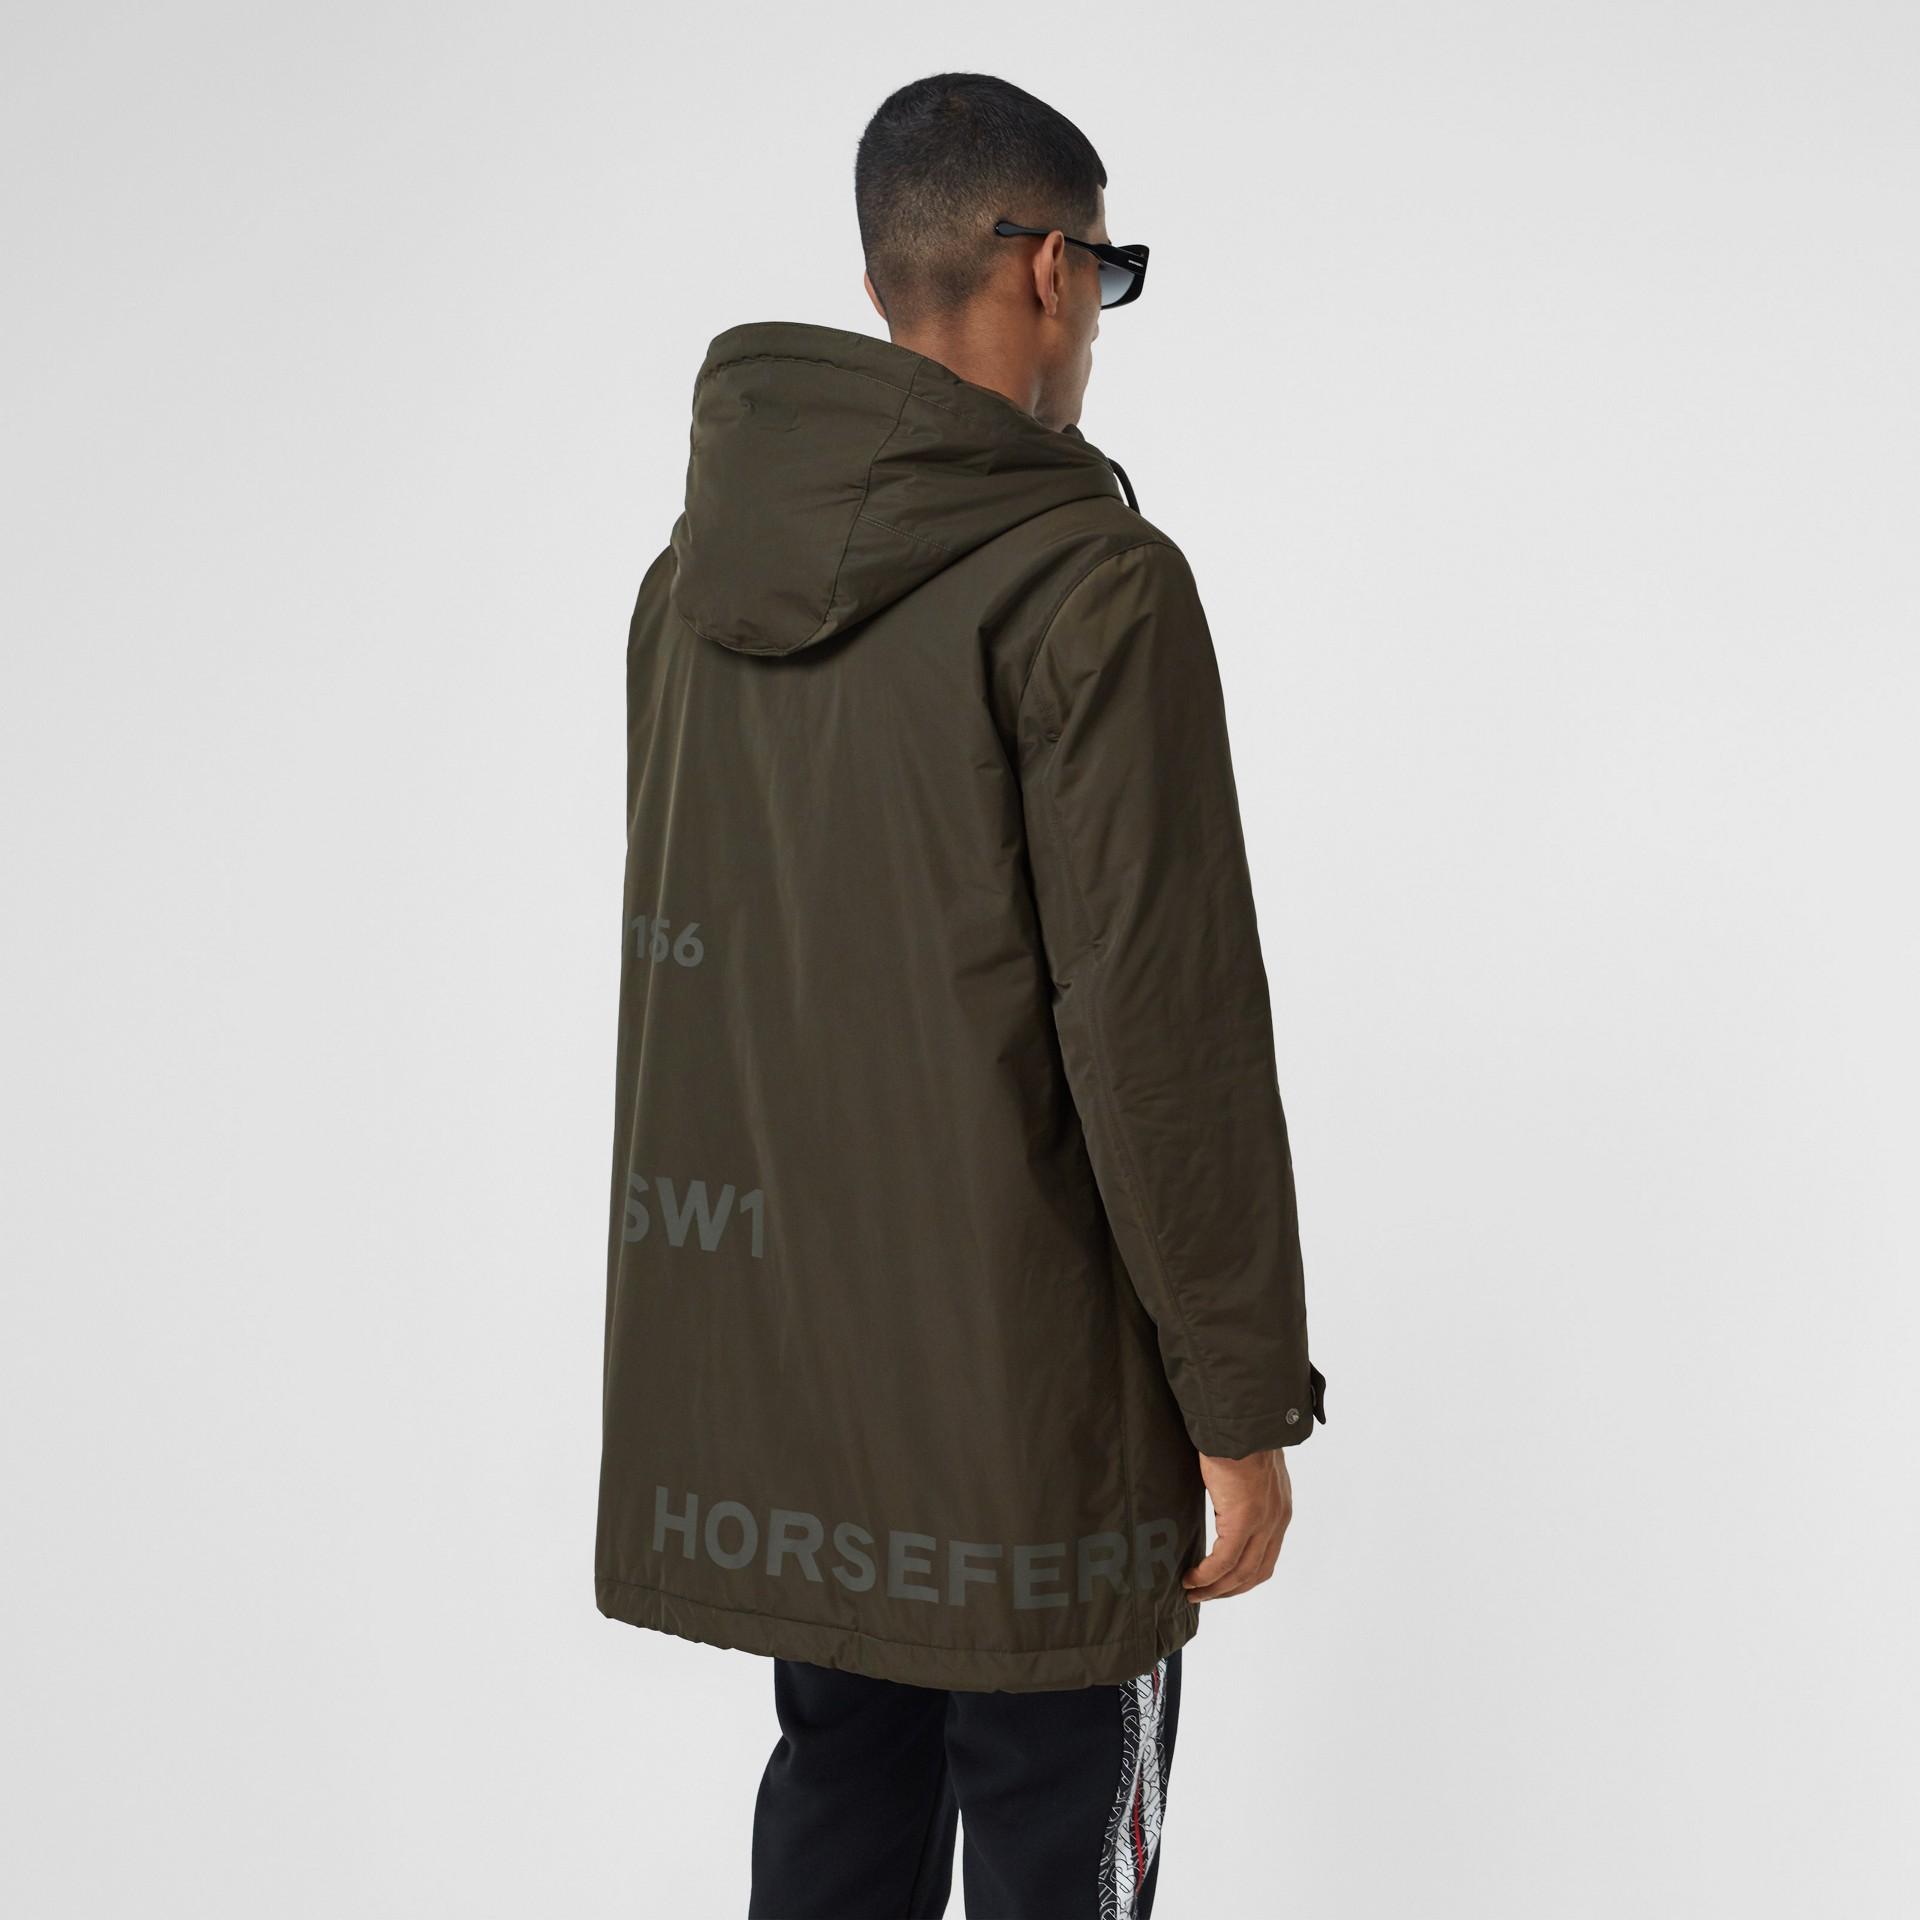 Horseferry Print Shape-memory Taffeta Hooded Coat in Khaki - Men | Burberry - gallery image 2